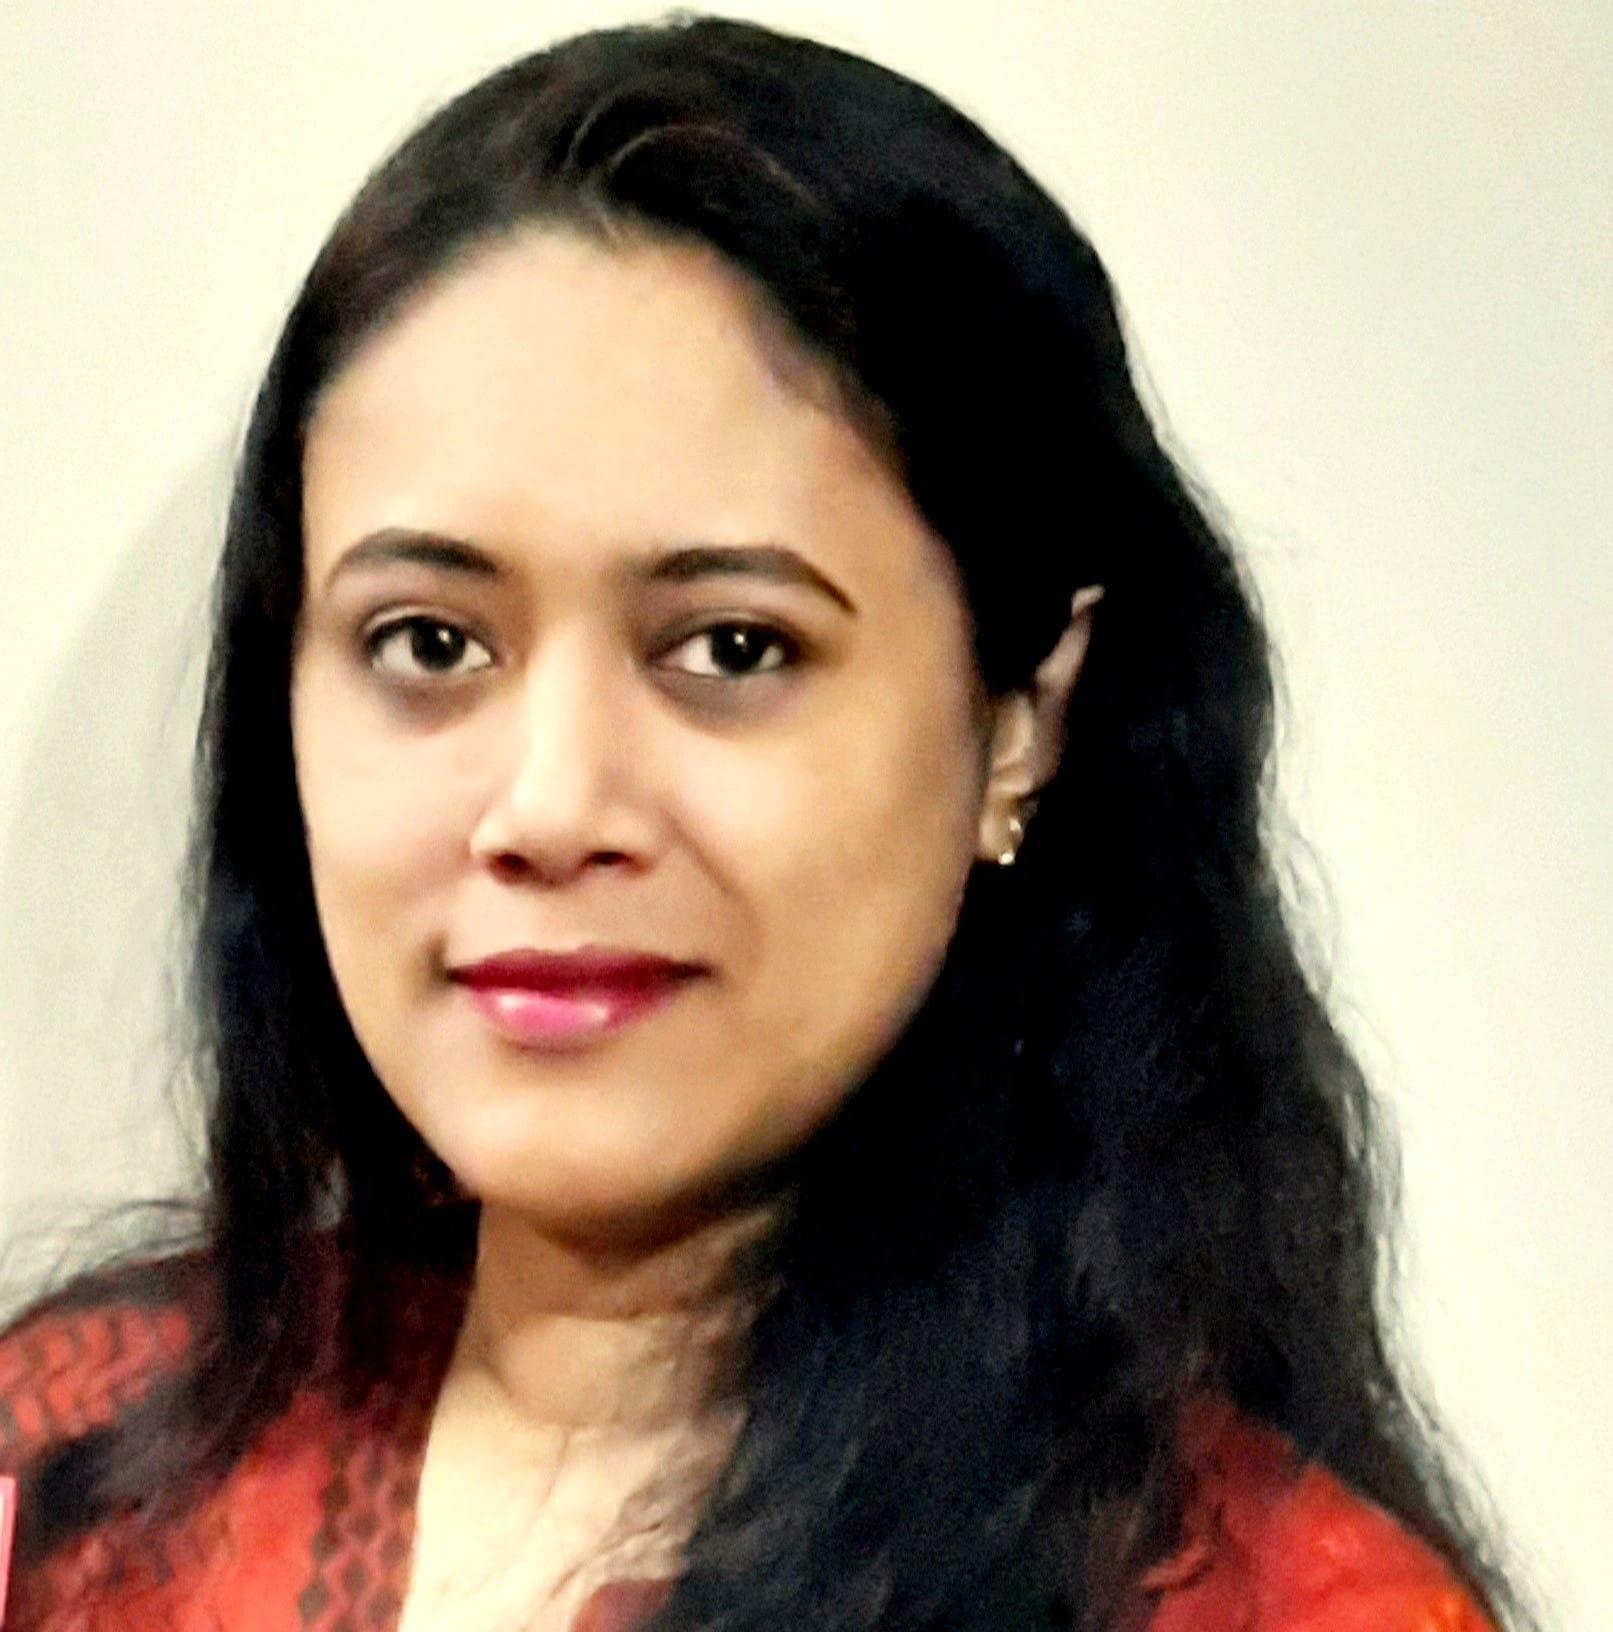 Dr. Akhter Jahan